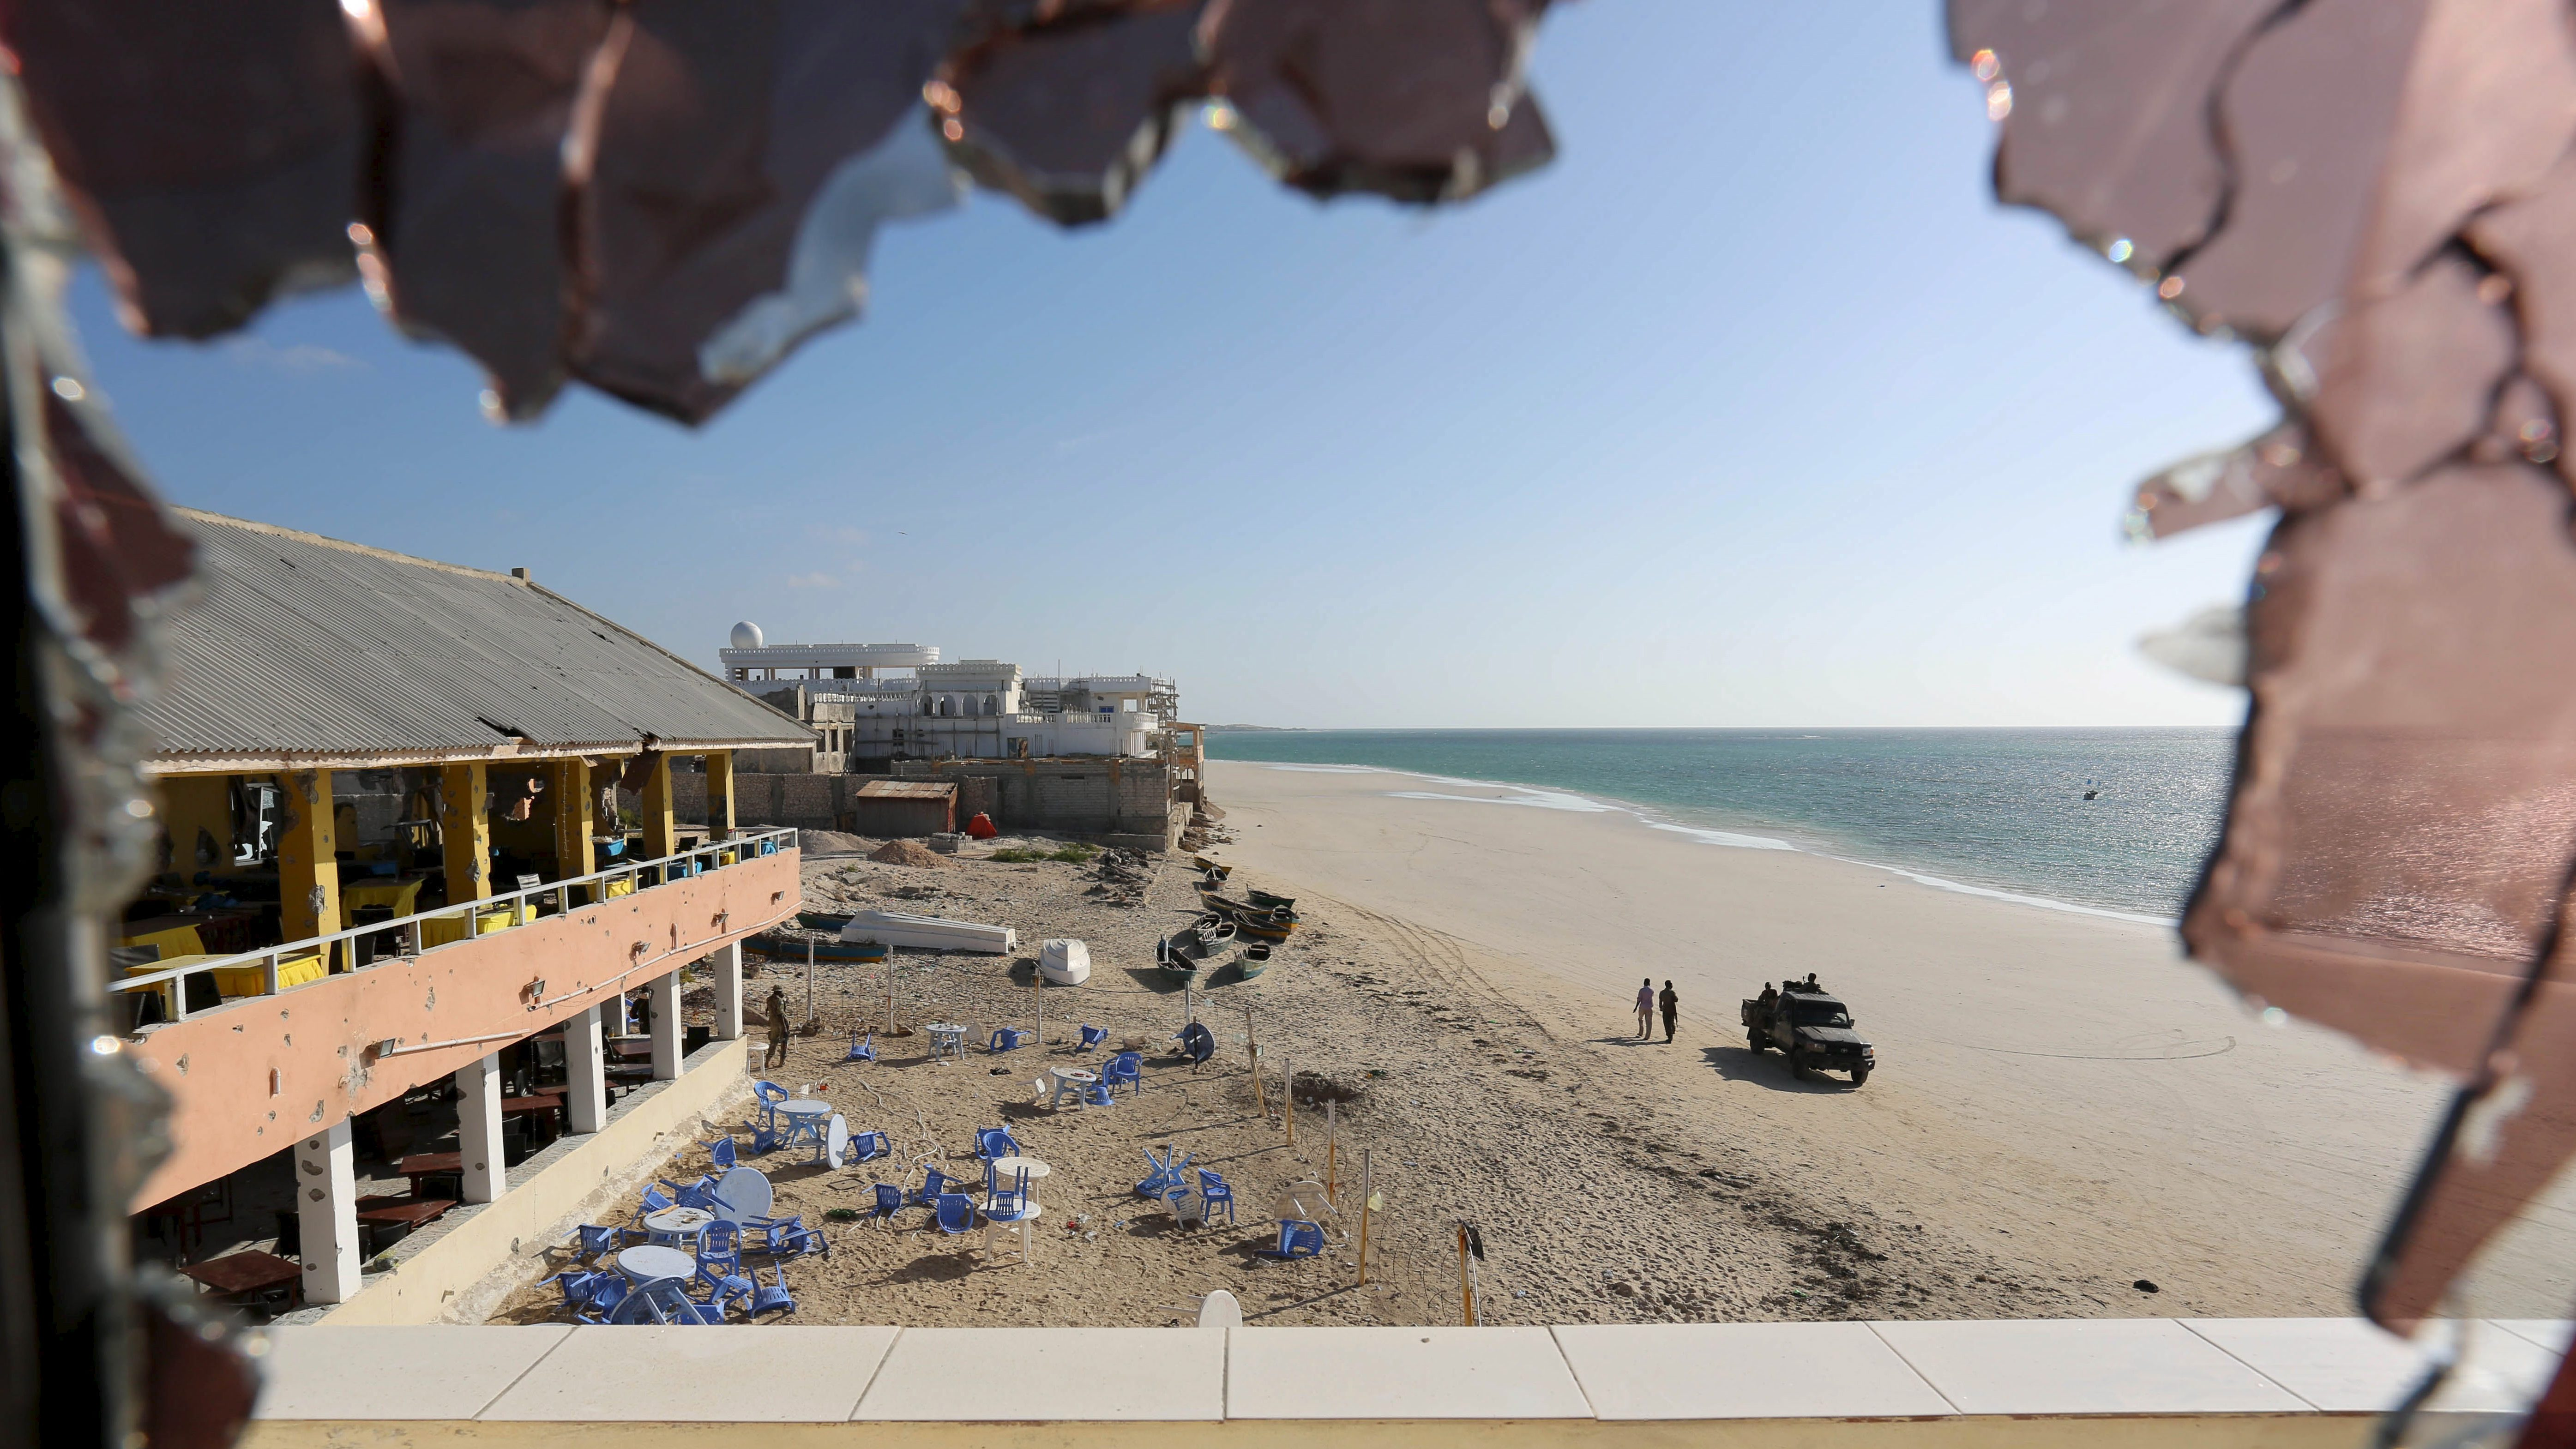 S On Somalia Beaches Hotels And Restaurants The Last Bastions Of Safety In Capital Mogadishu Are No Longer Safe Quartz